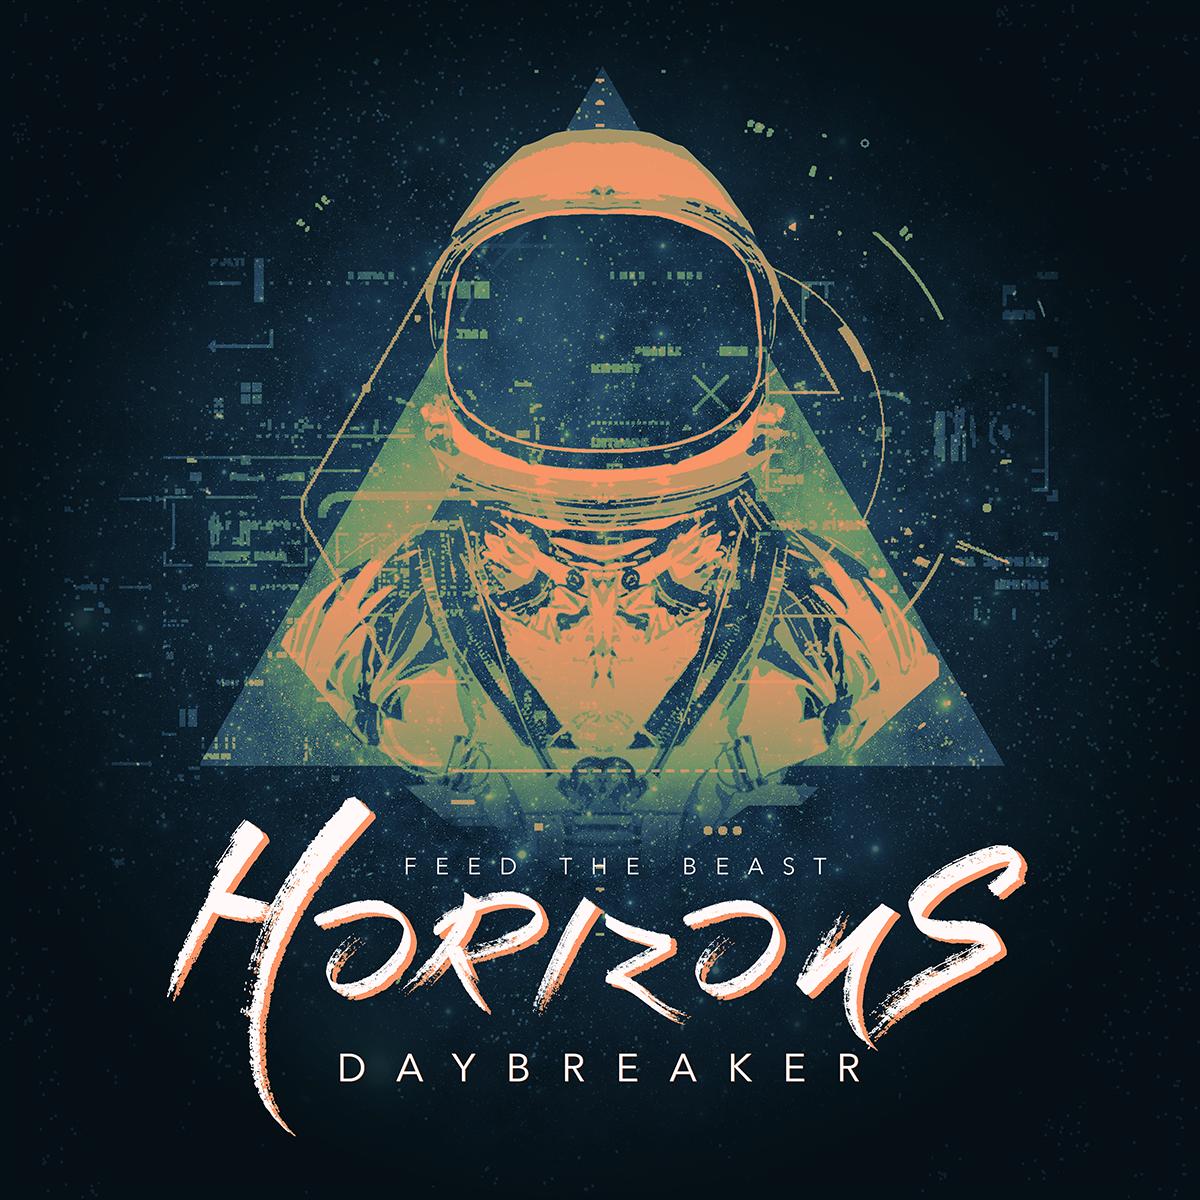 FTBHorizonsII-1 2 0-1 7 10 zip - Files - FTB Horizons: Daybreaker